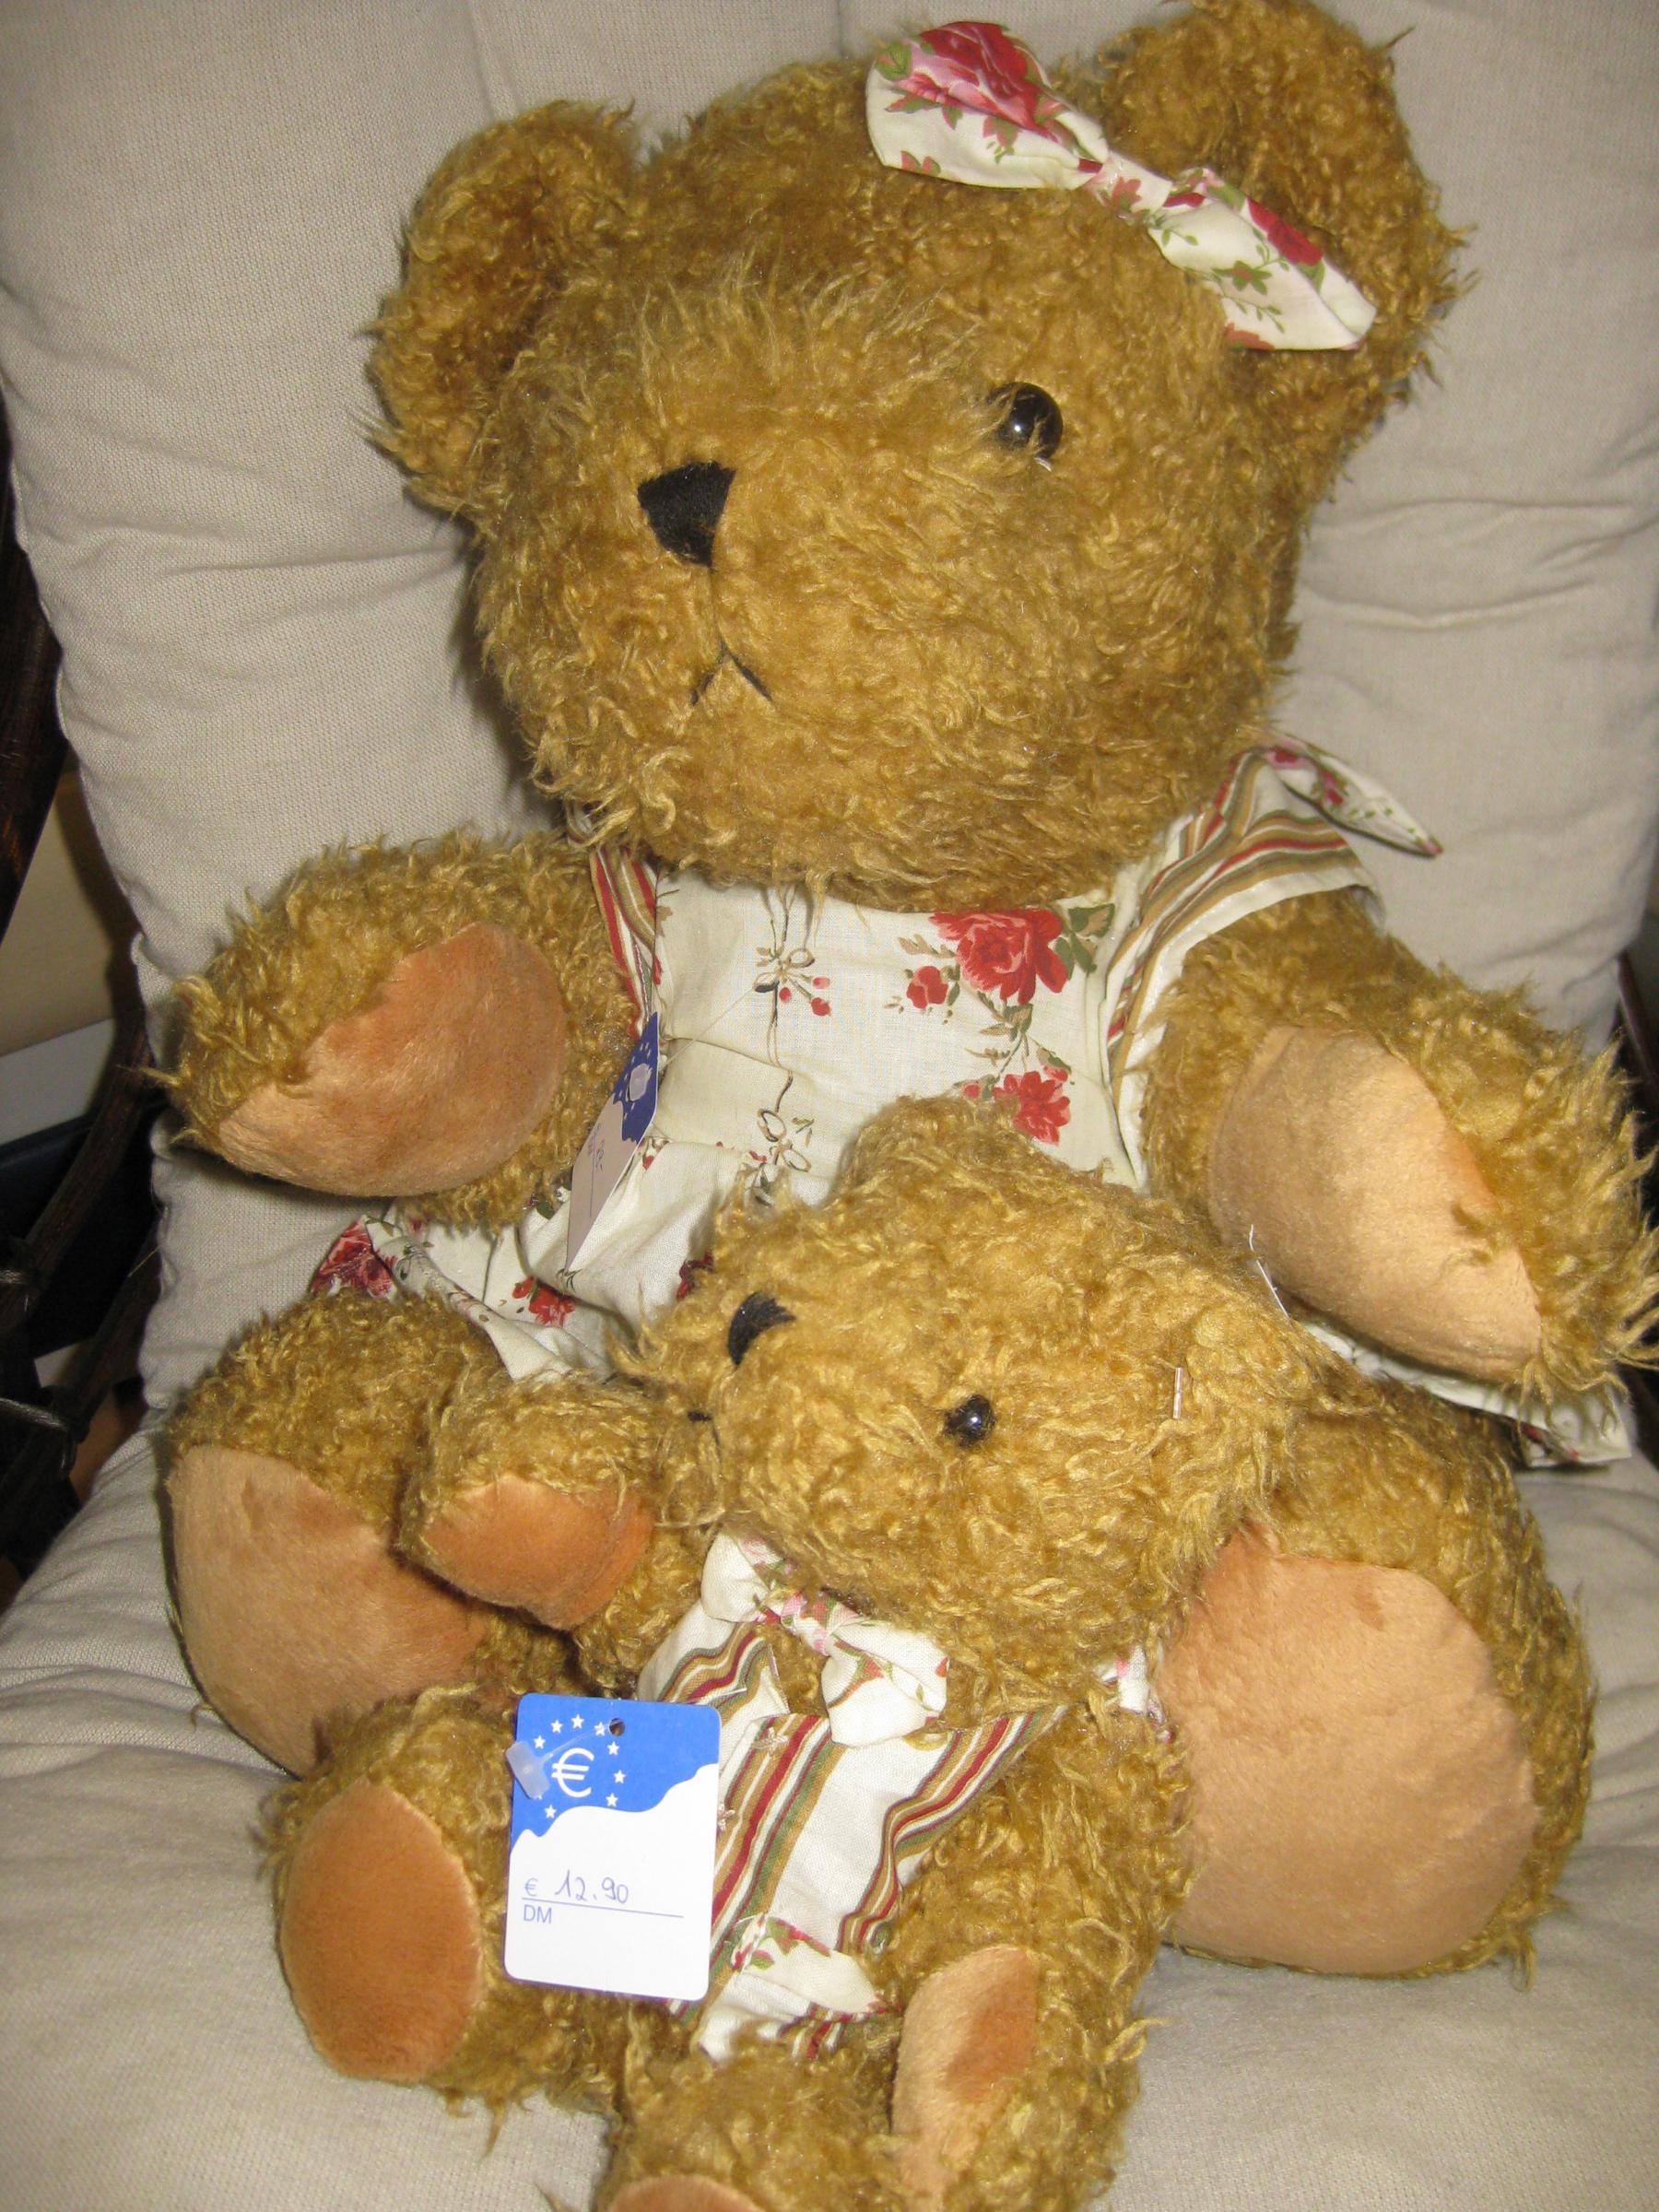 BearLarge Acquista ai With Ca35 Teddy letti Krebs Vest Cm Gelnhausen shrdtCQ